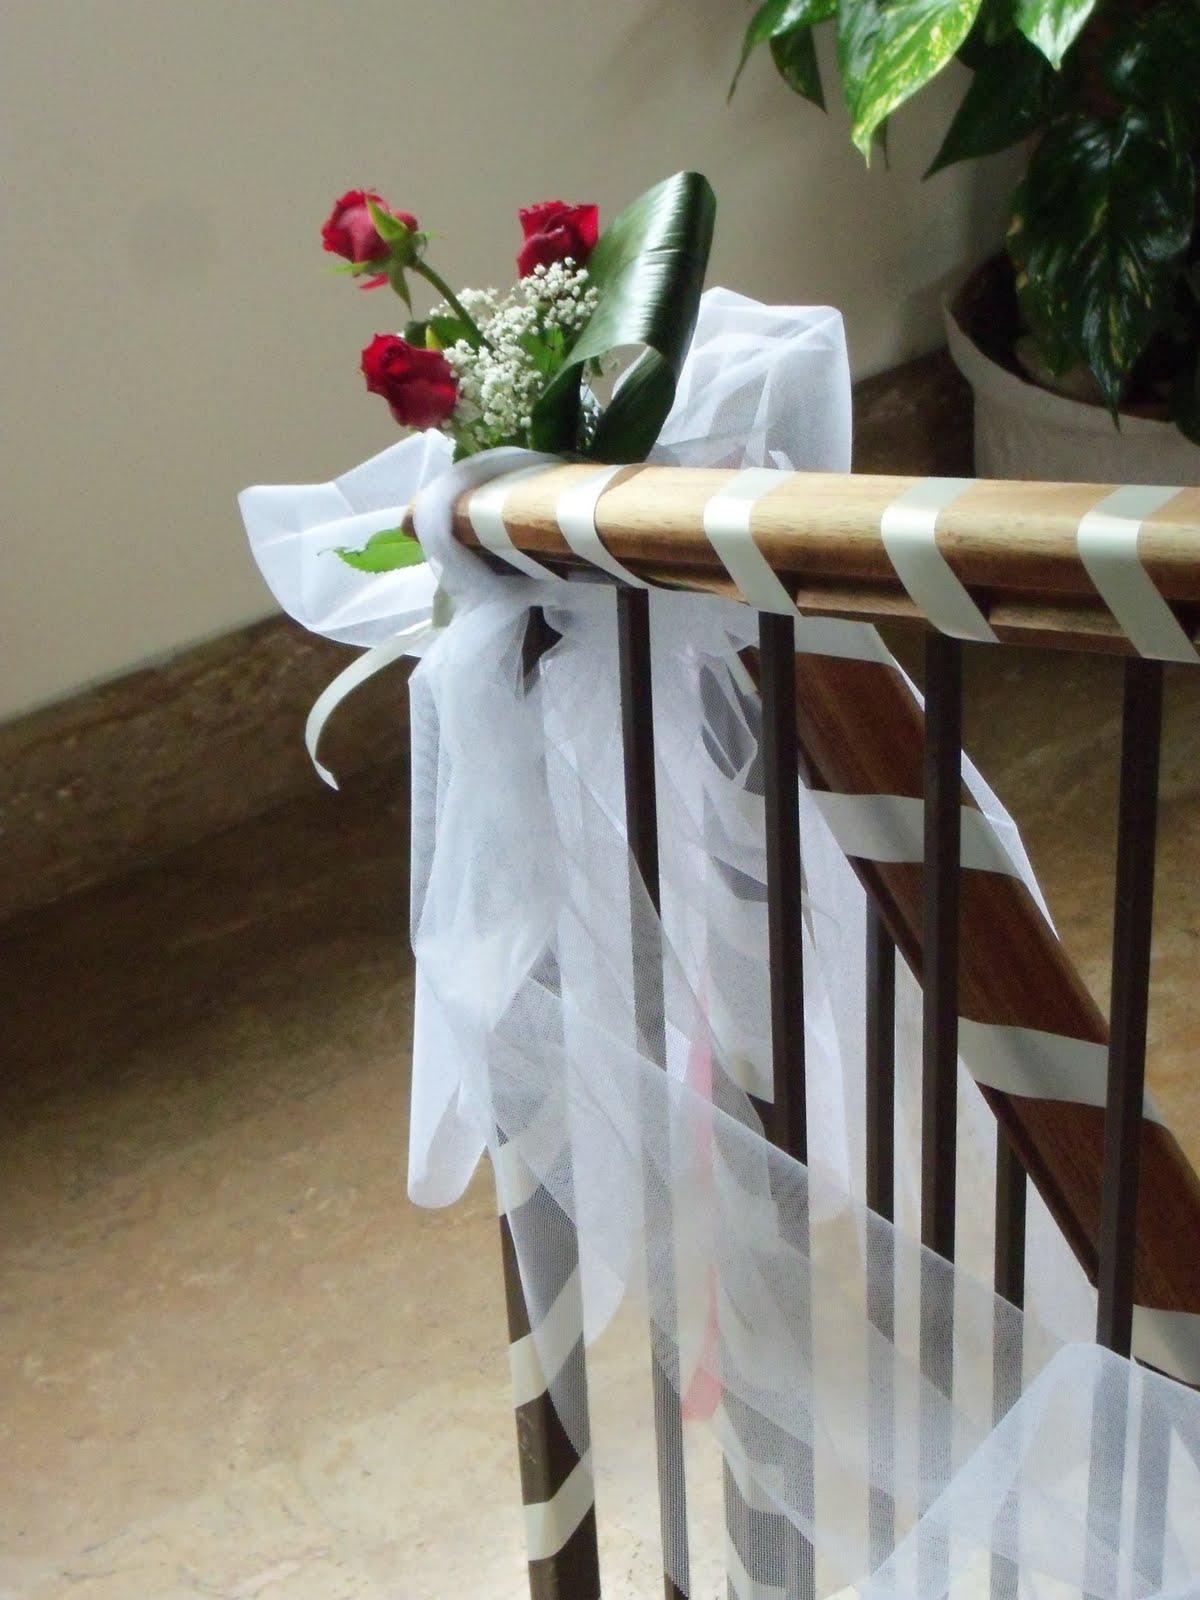 Tulle per addobbi matrimonio at63 regardsdefemmes - Addobbi matrimonio casa della sposa ...